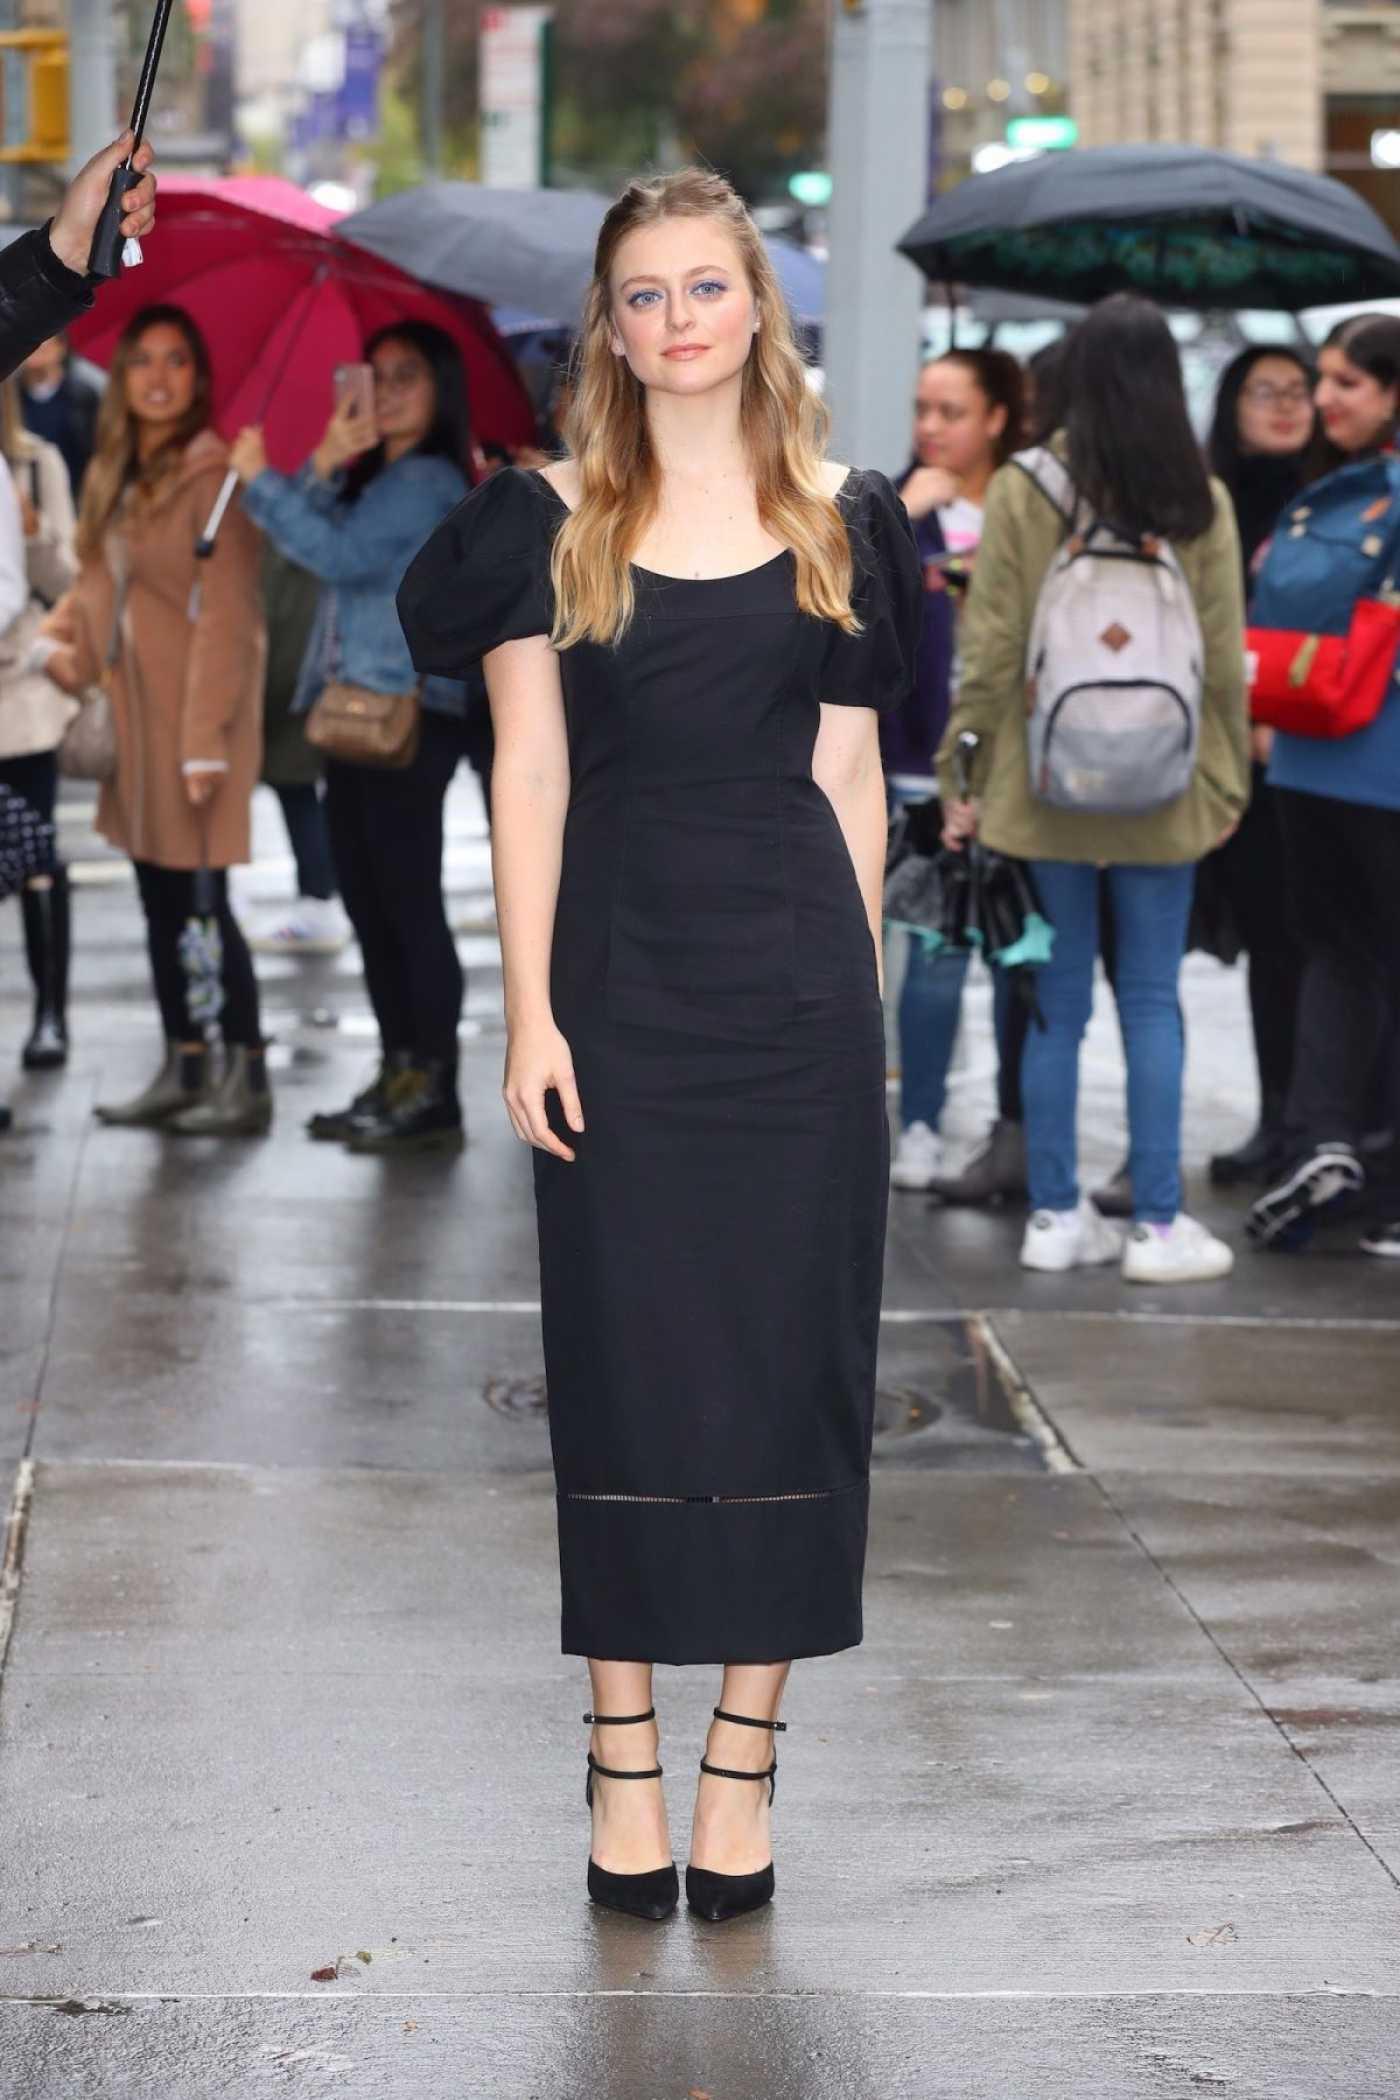 Anna Baryshnikov in a Black Dress Arrives at AOL Build Studio in New York 10/31/2019